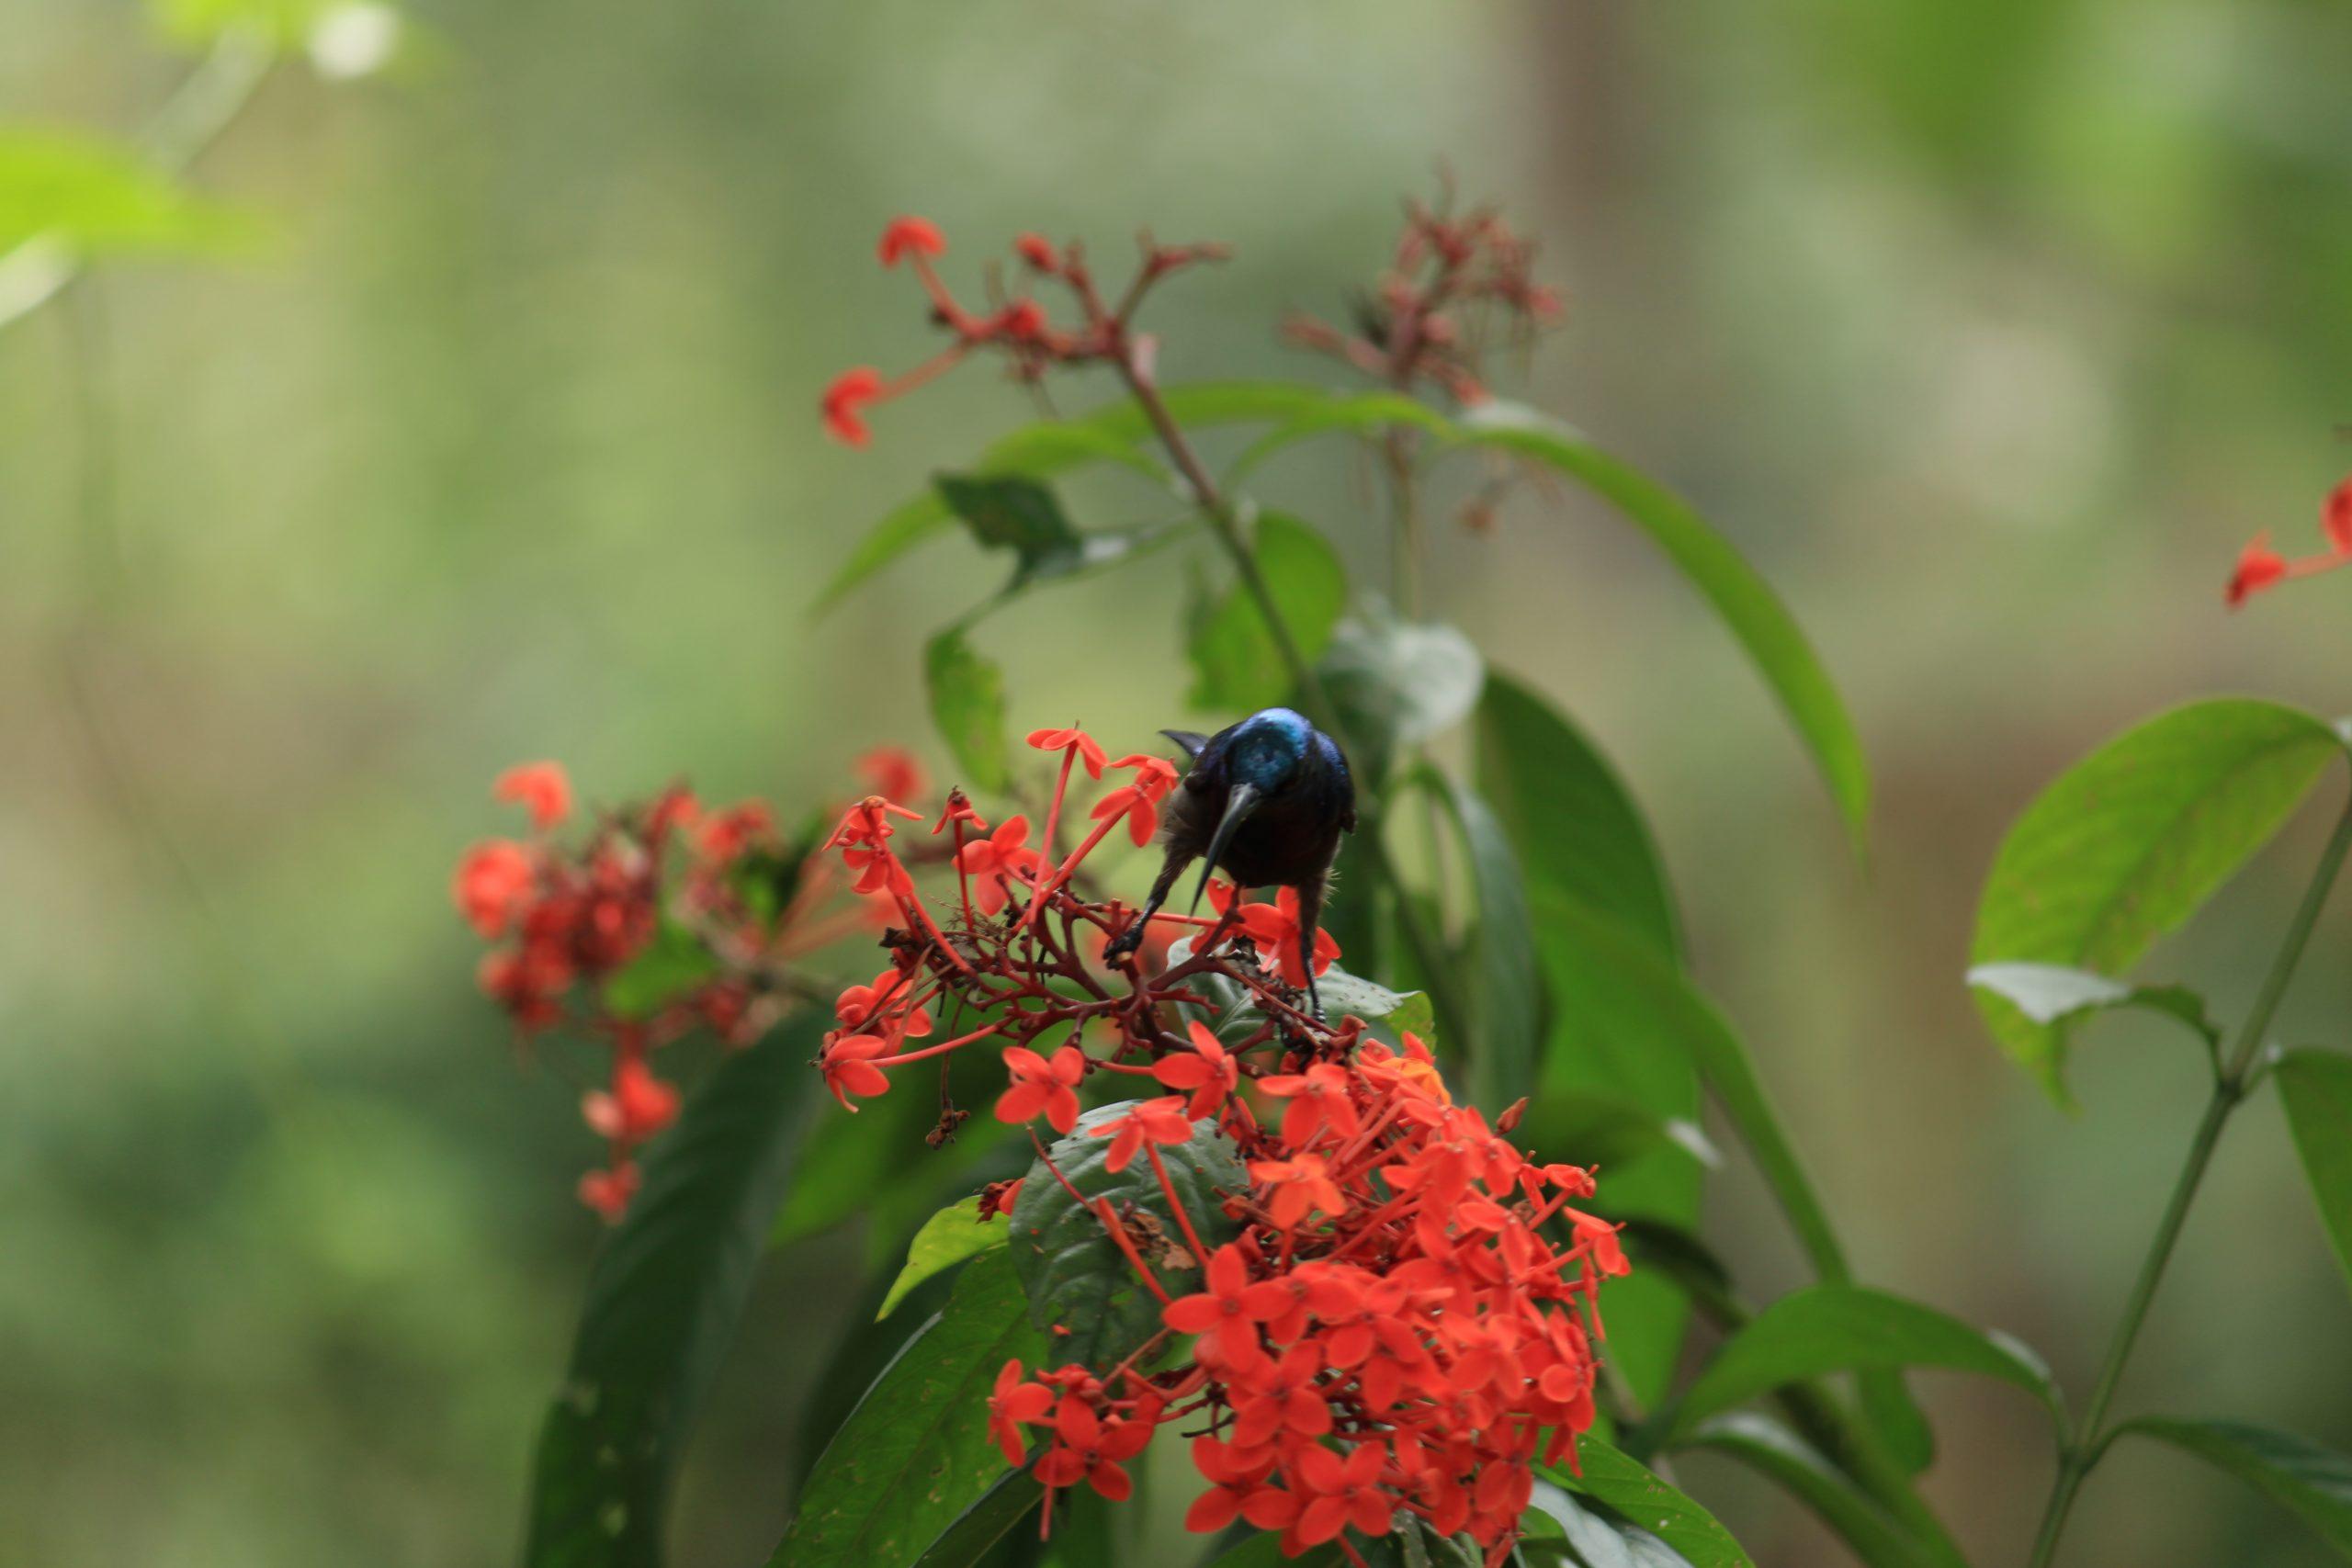 Bird sitting on the flower